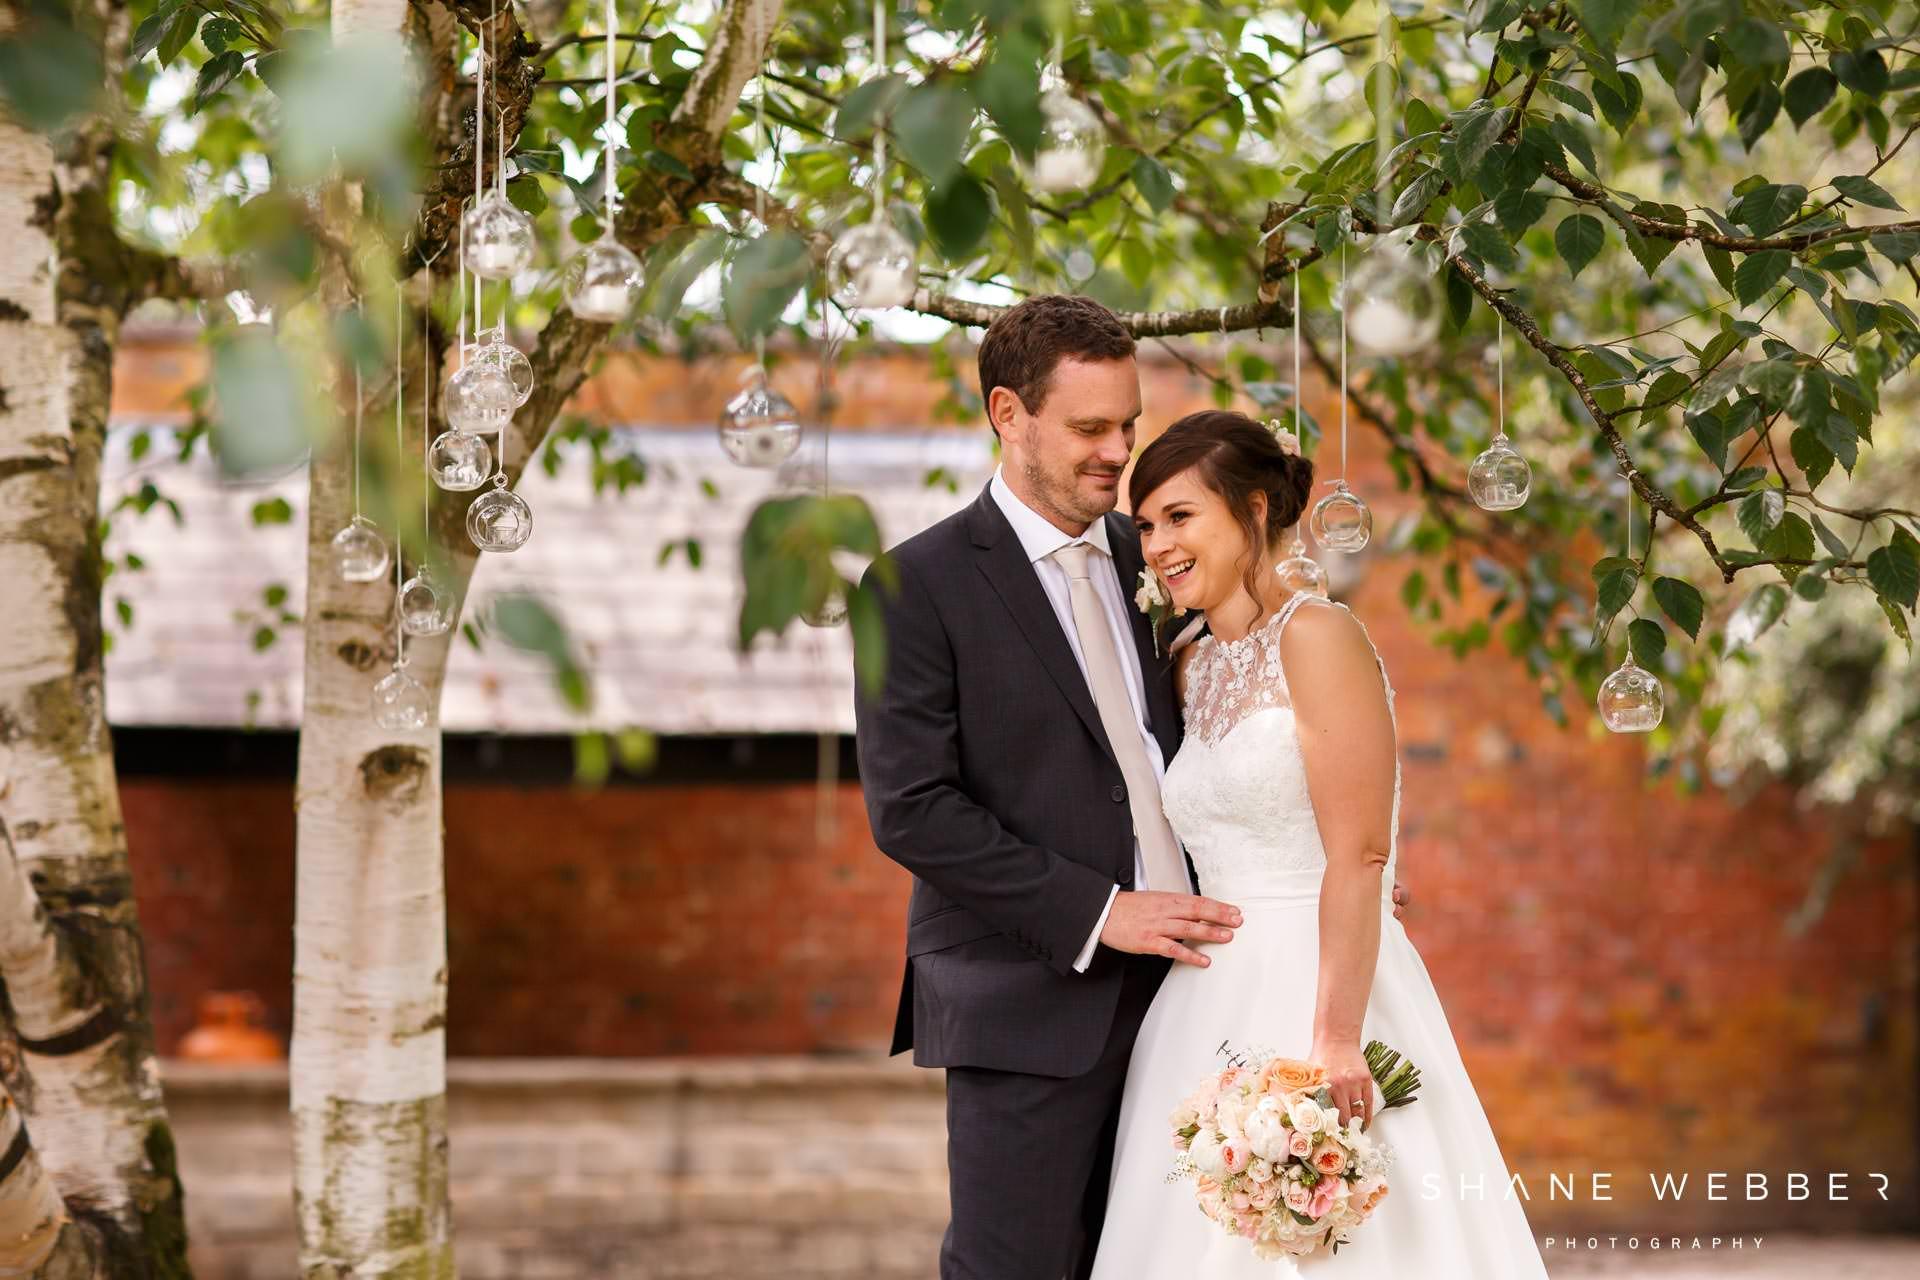 Bartle Hall wedding photos